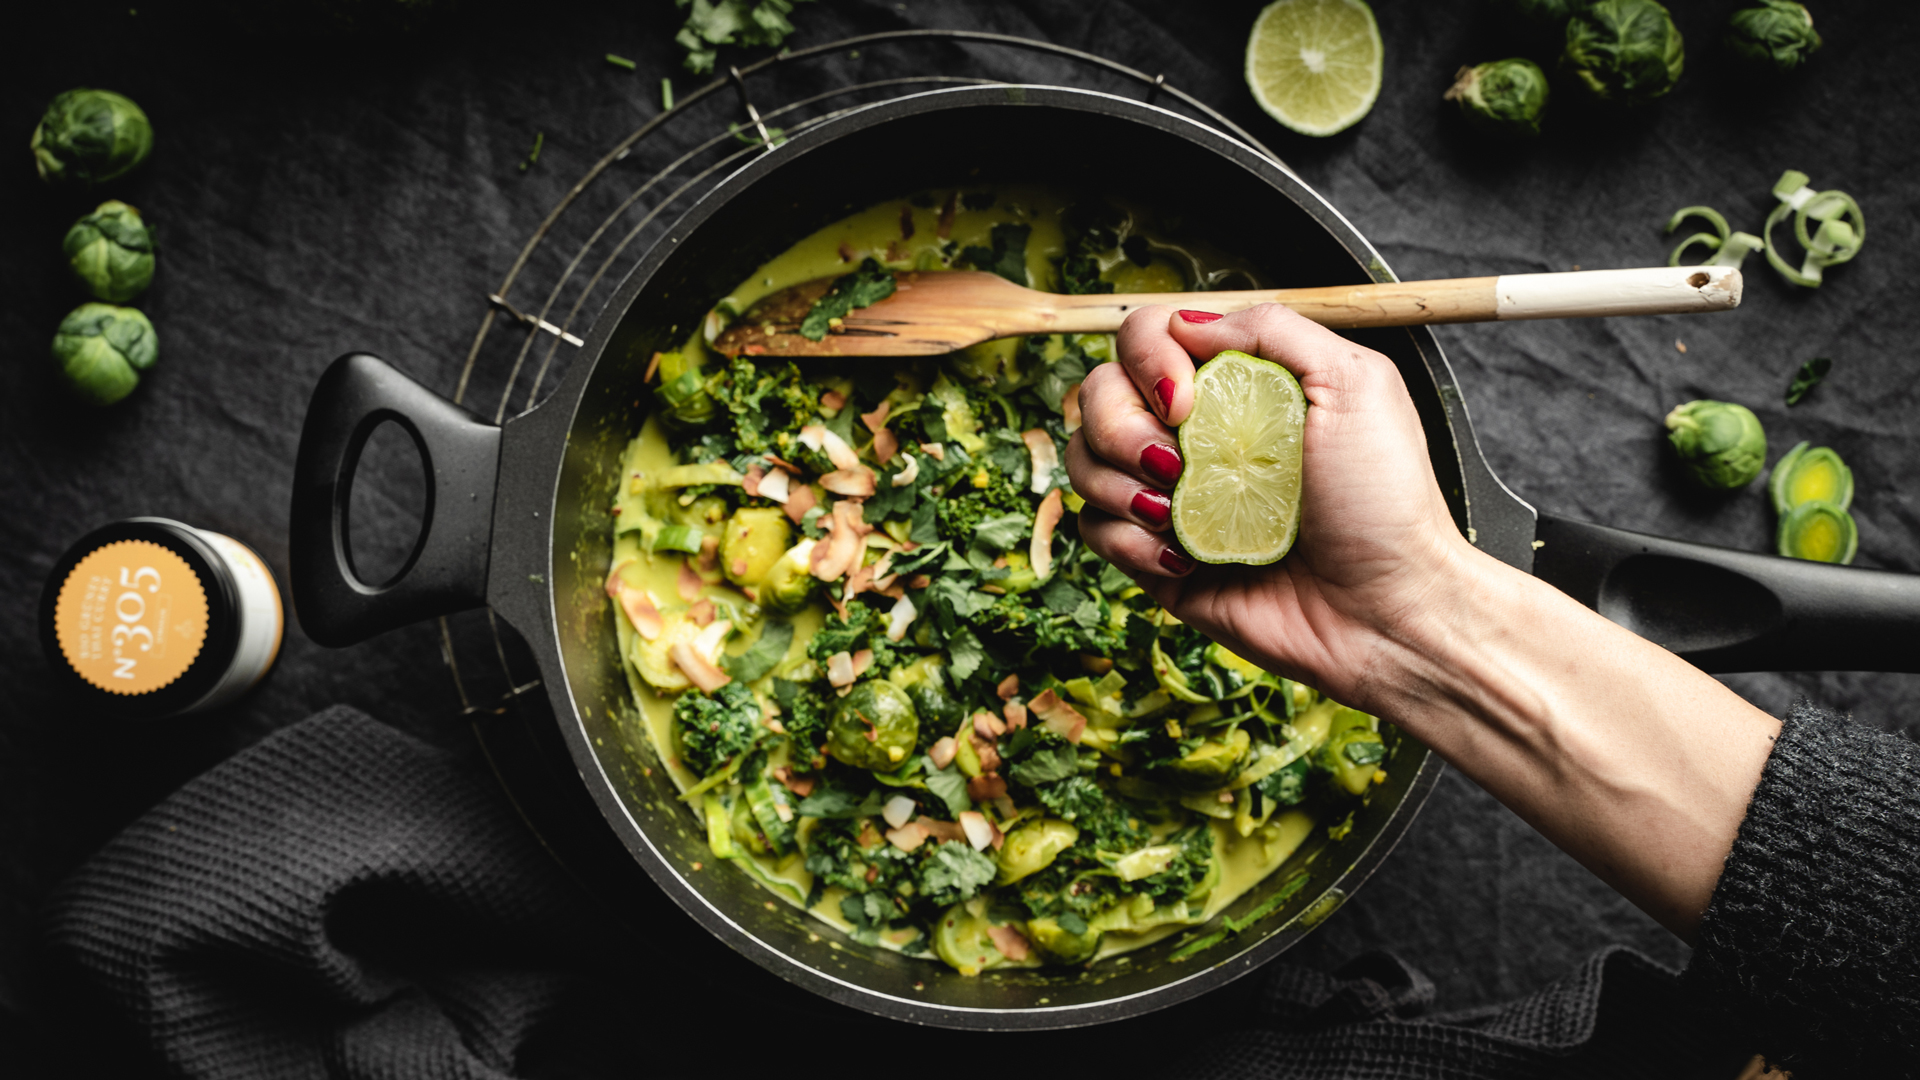 gruenes-thai-curry-rezept-305-limette-rimoco-gewuerze16x9